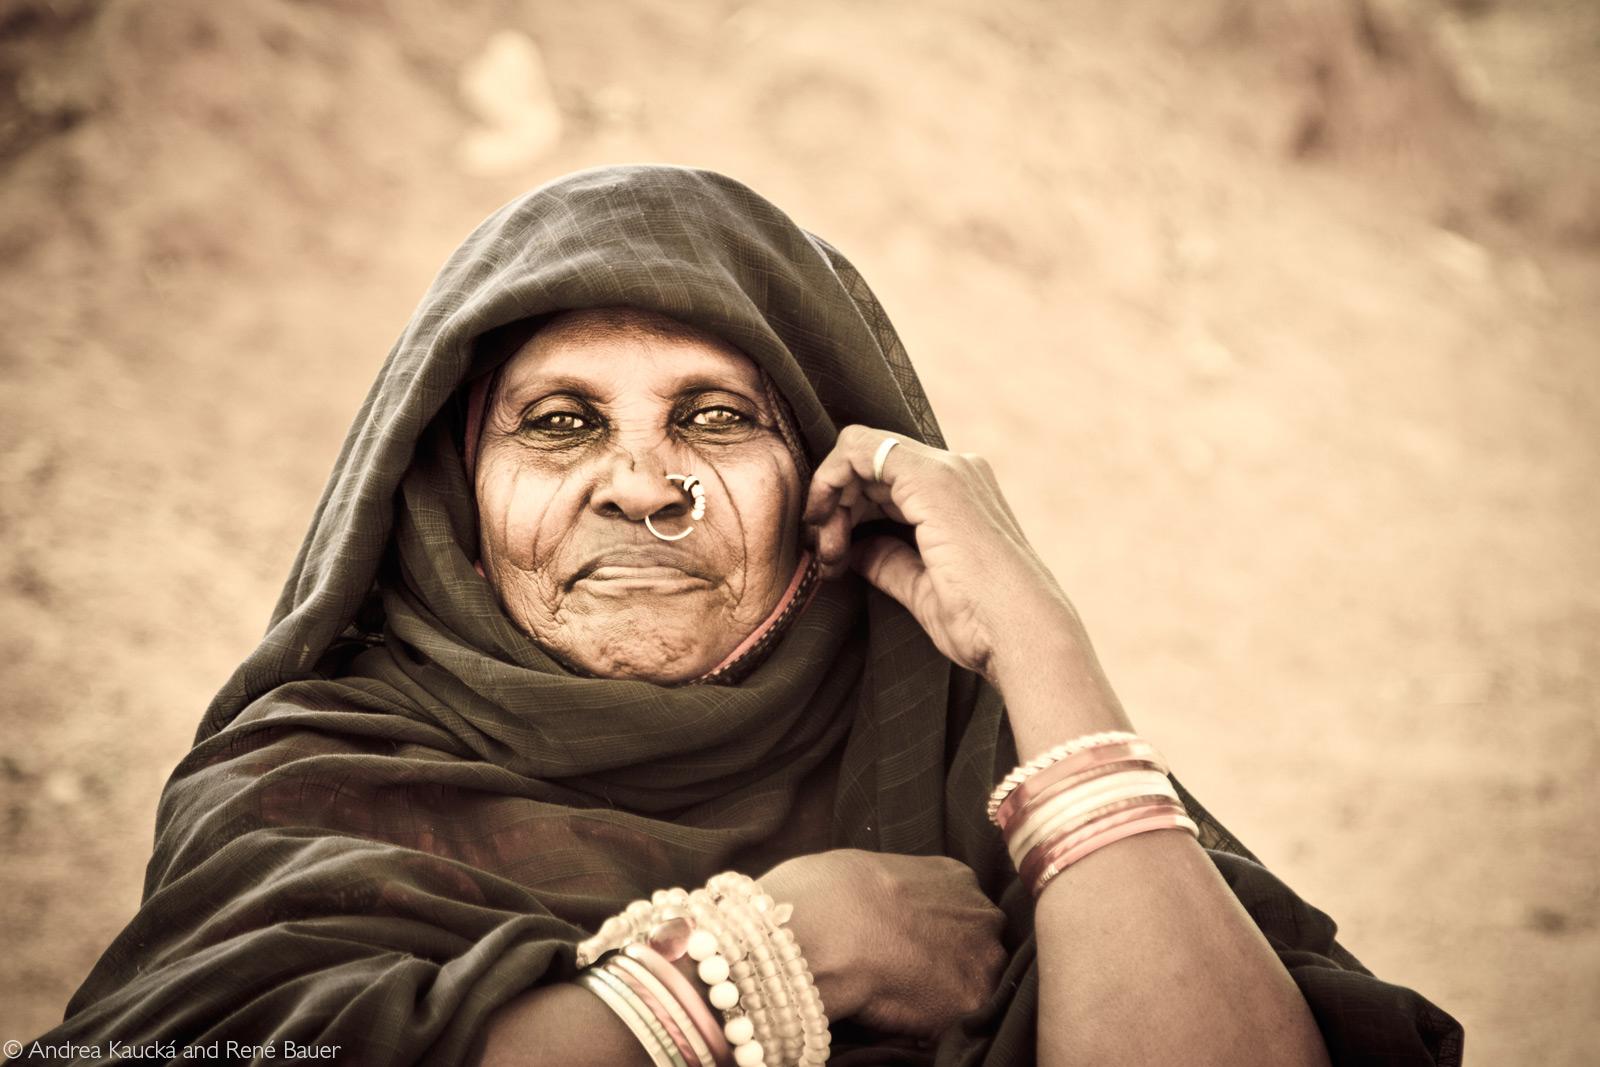 A nomad woman in Kassala, Sudan © Andrea Kaucká and René Bauer